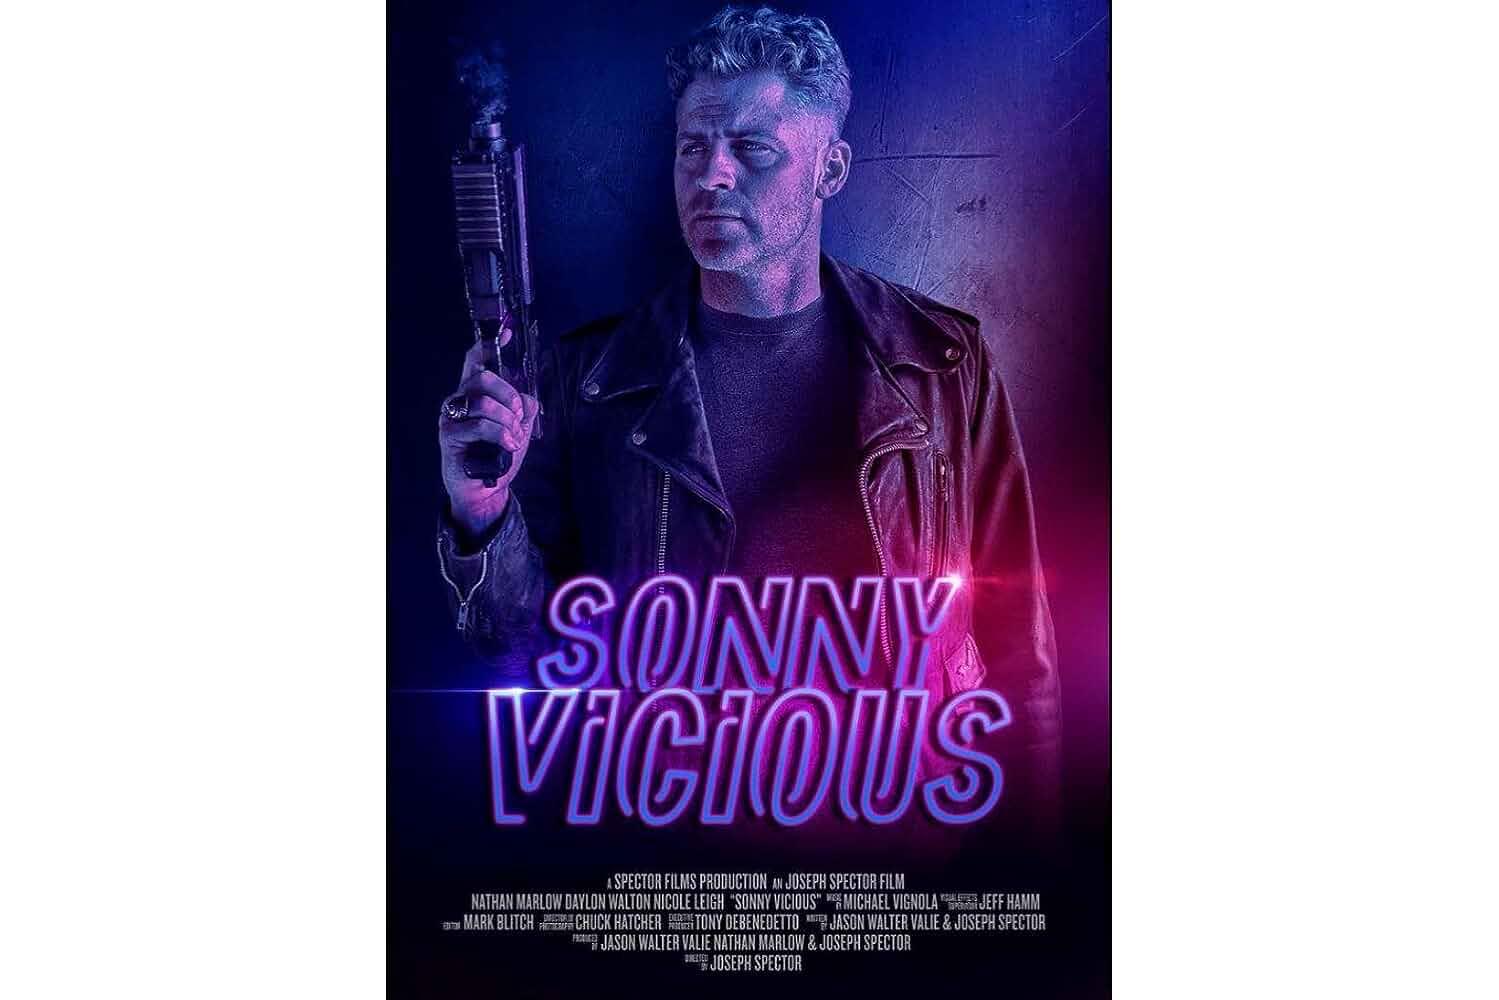 Sonny Vicious (2018)